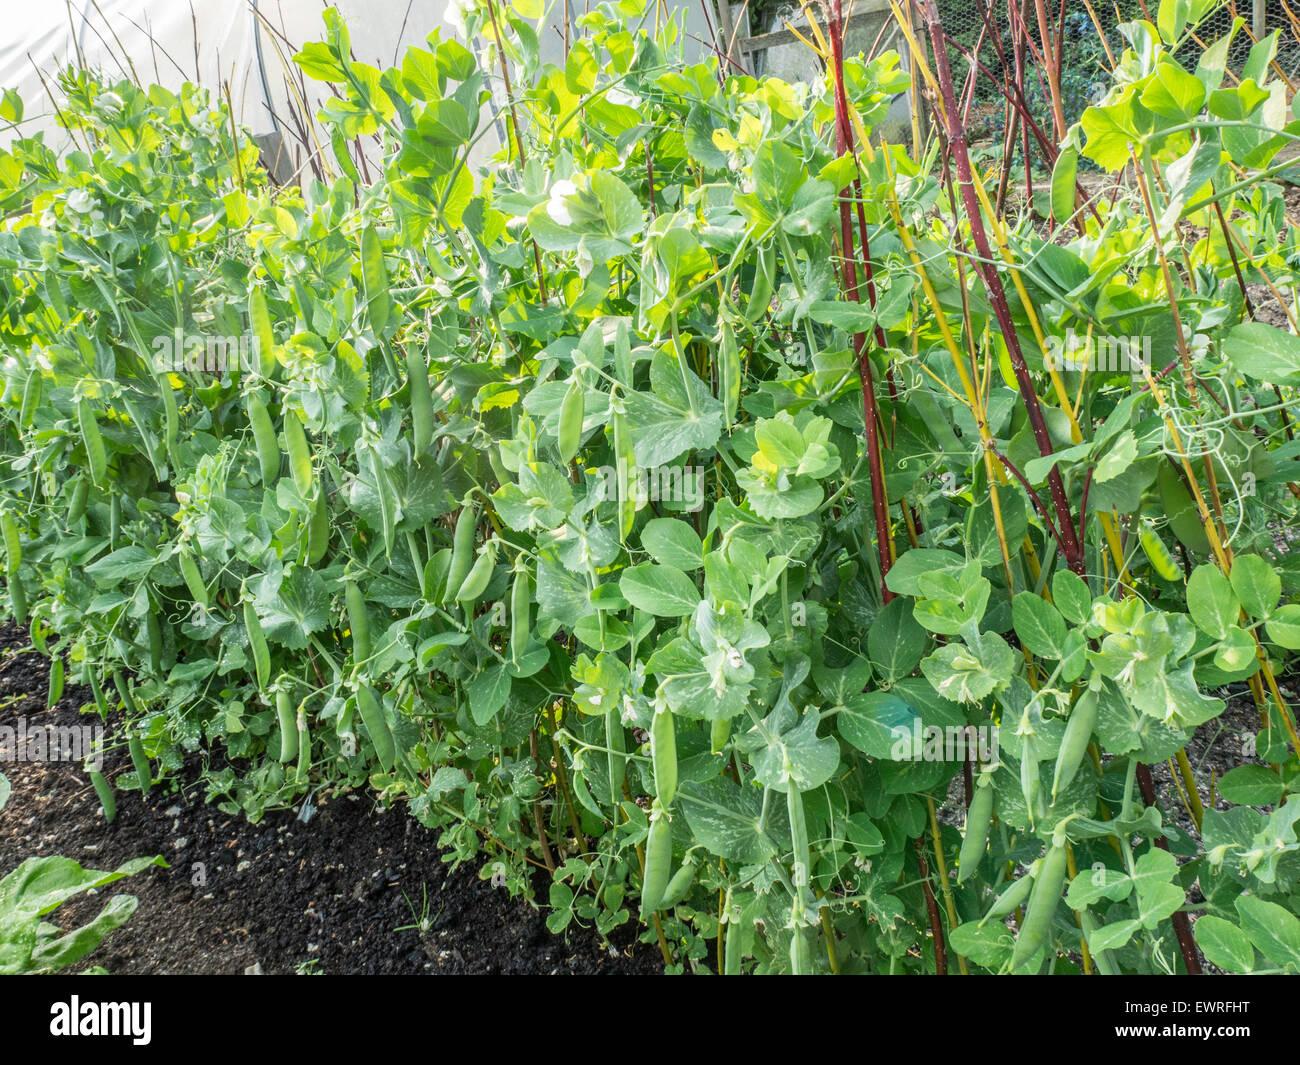 Garden pea 'Meteor' - Stock Image